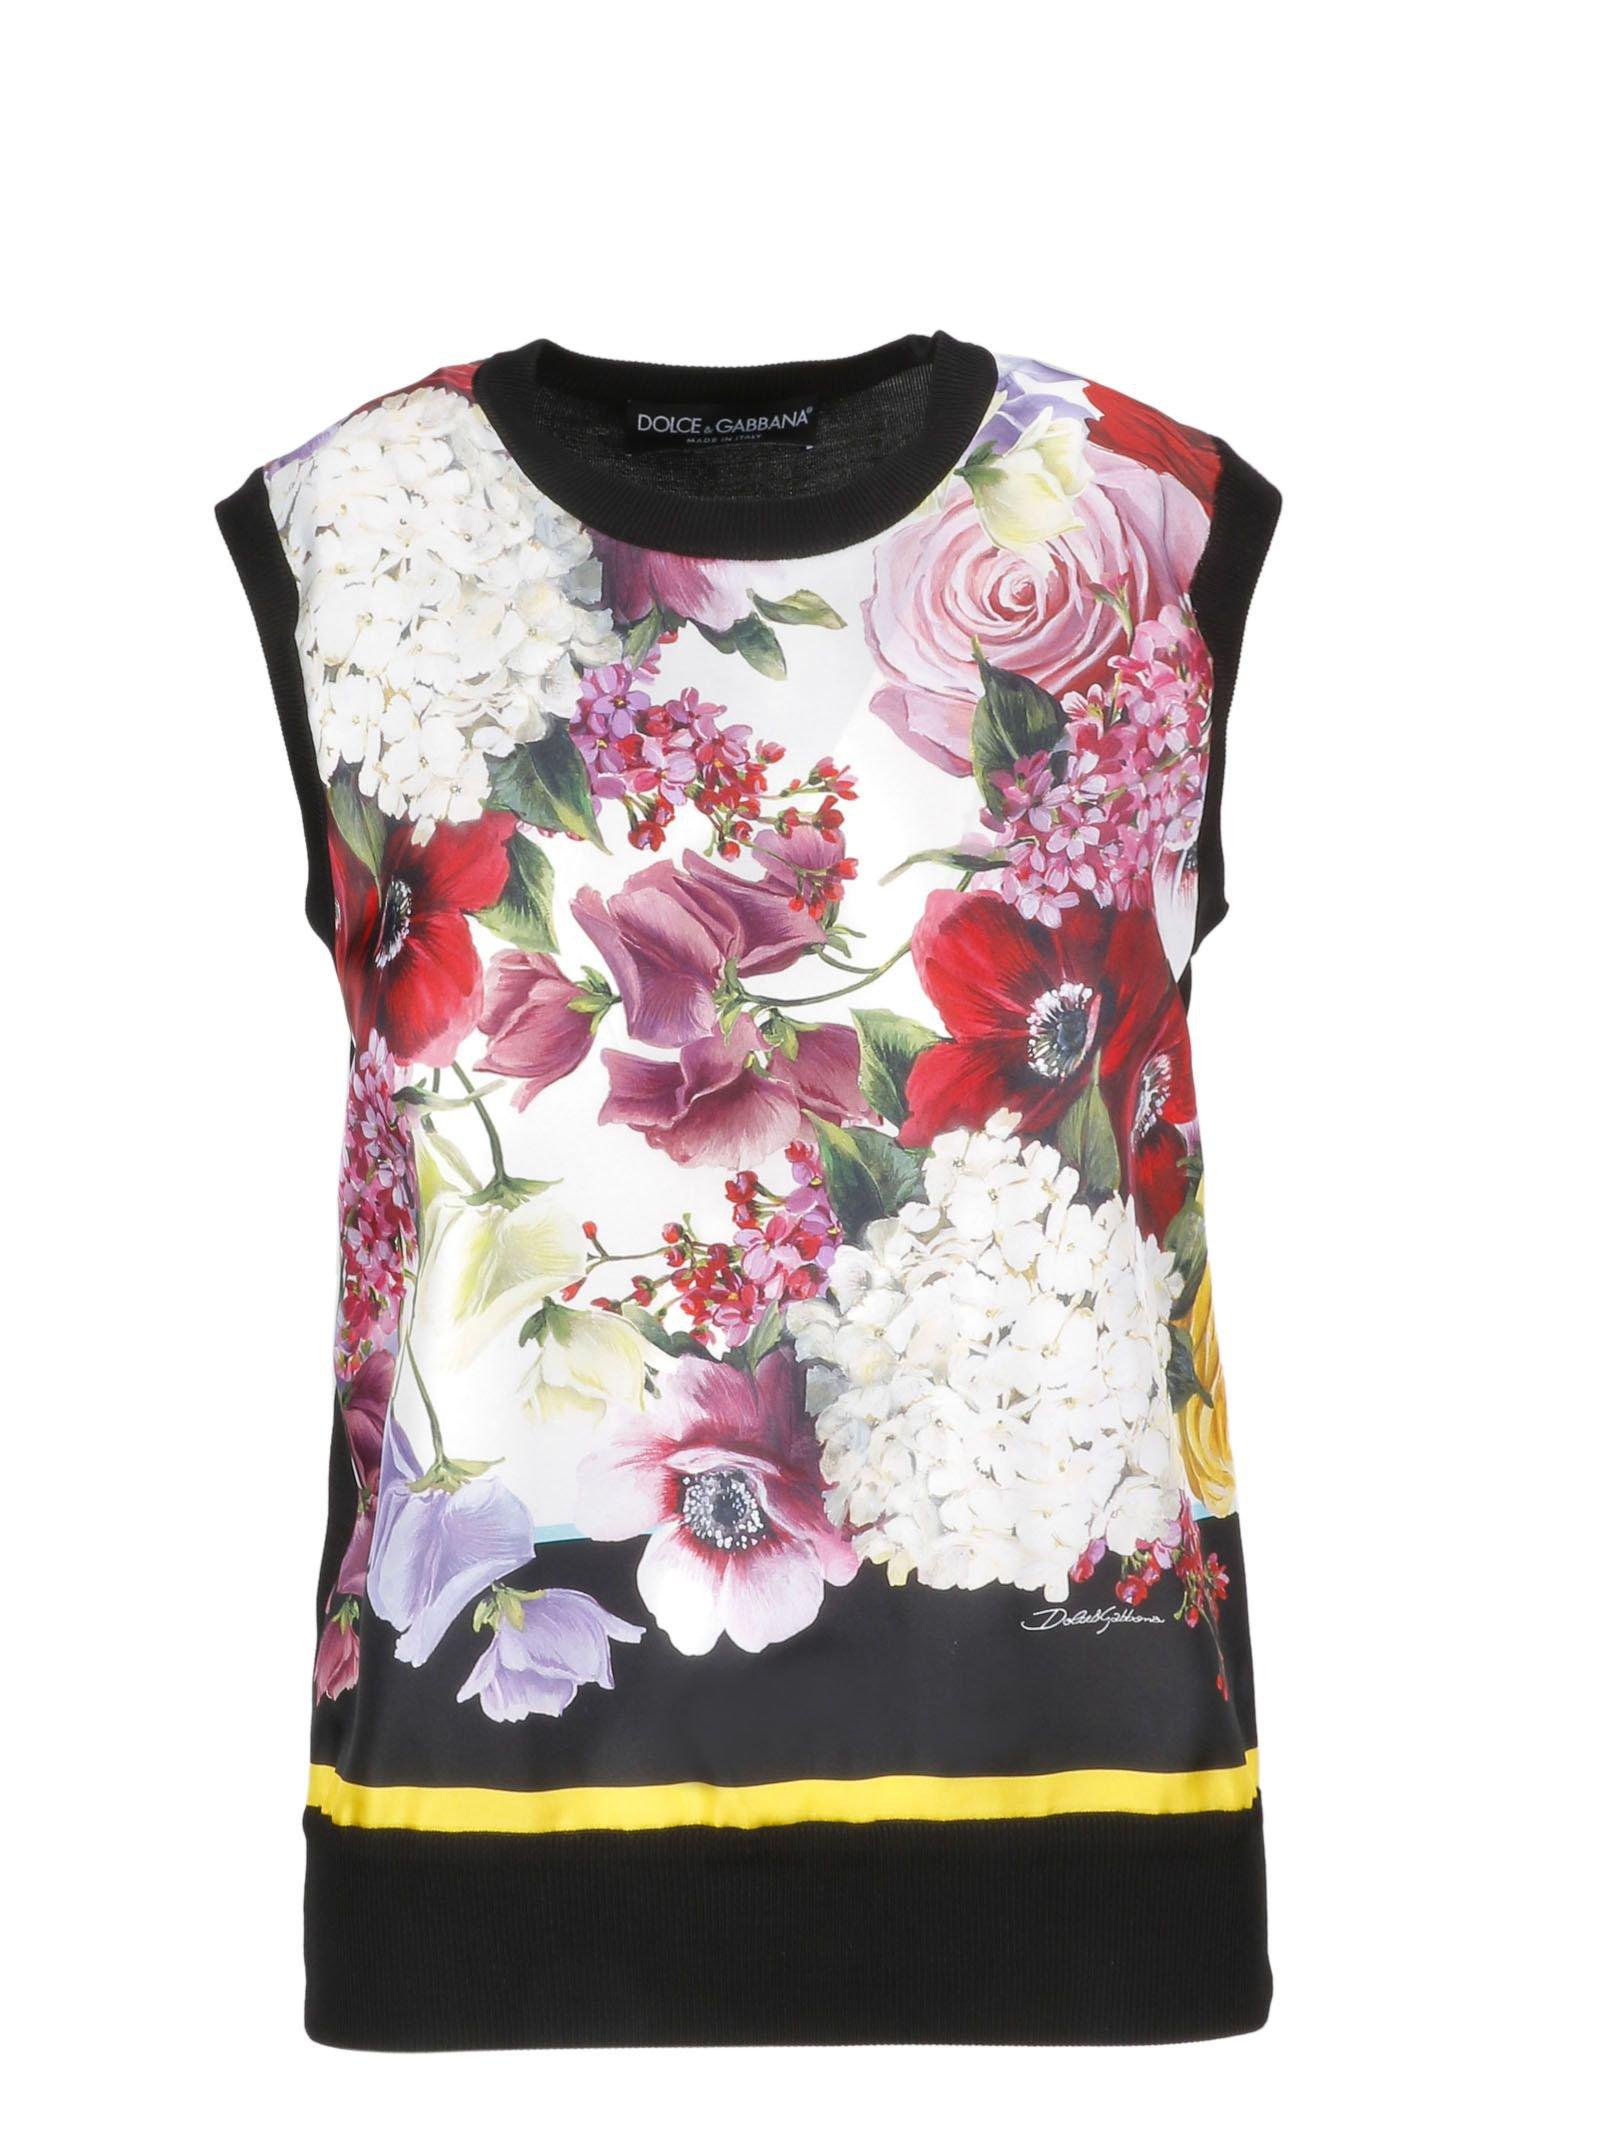 Dolce & Gabbana Floral Blouse